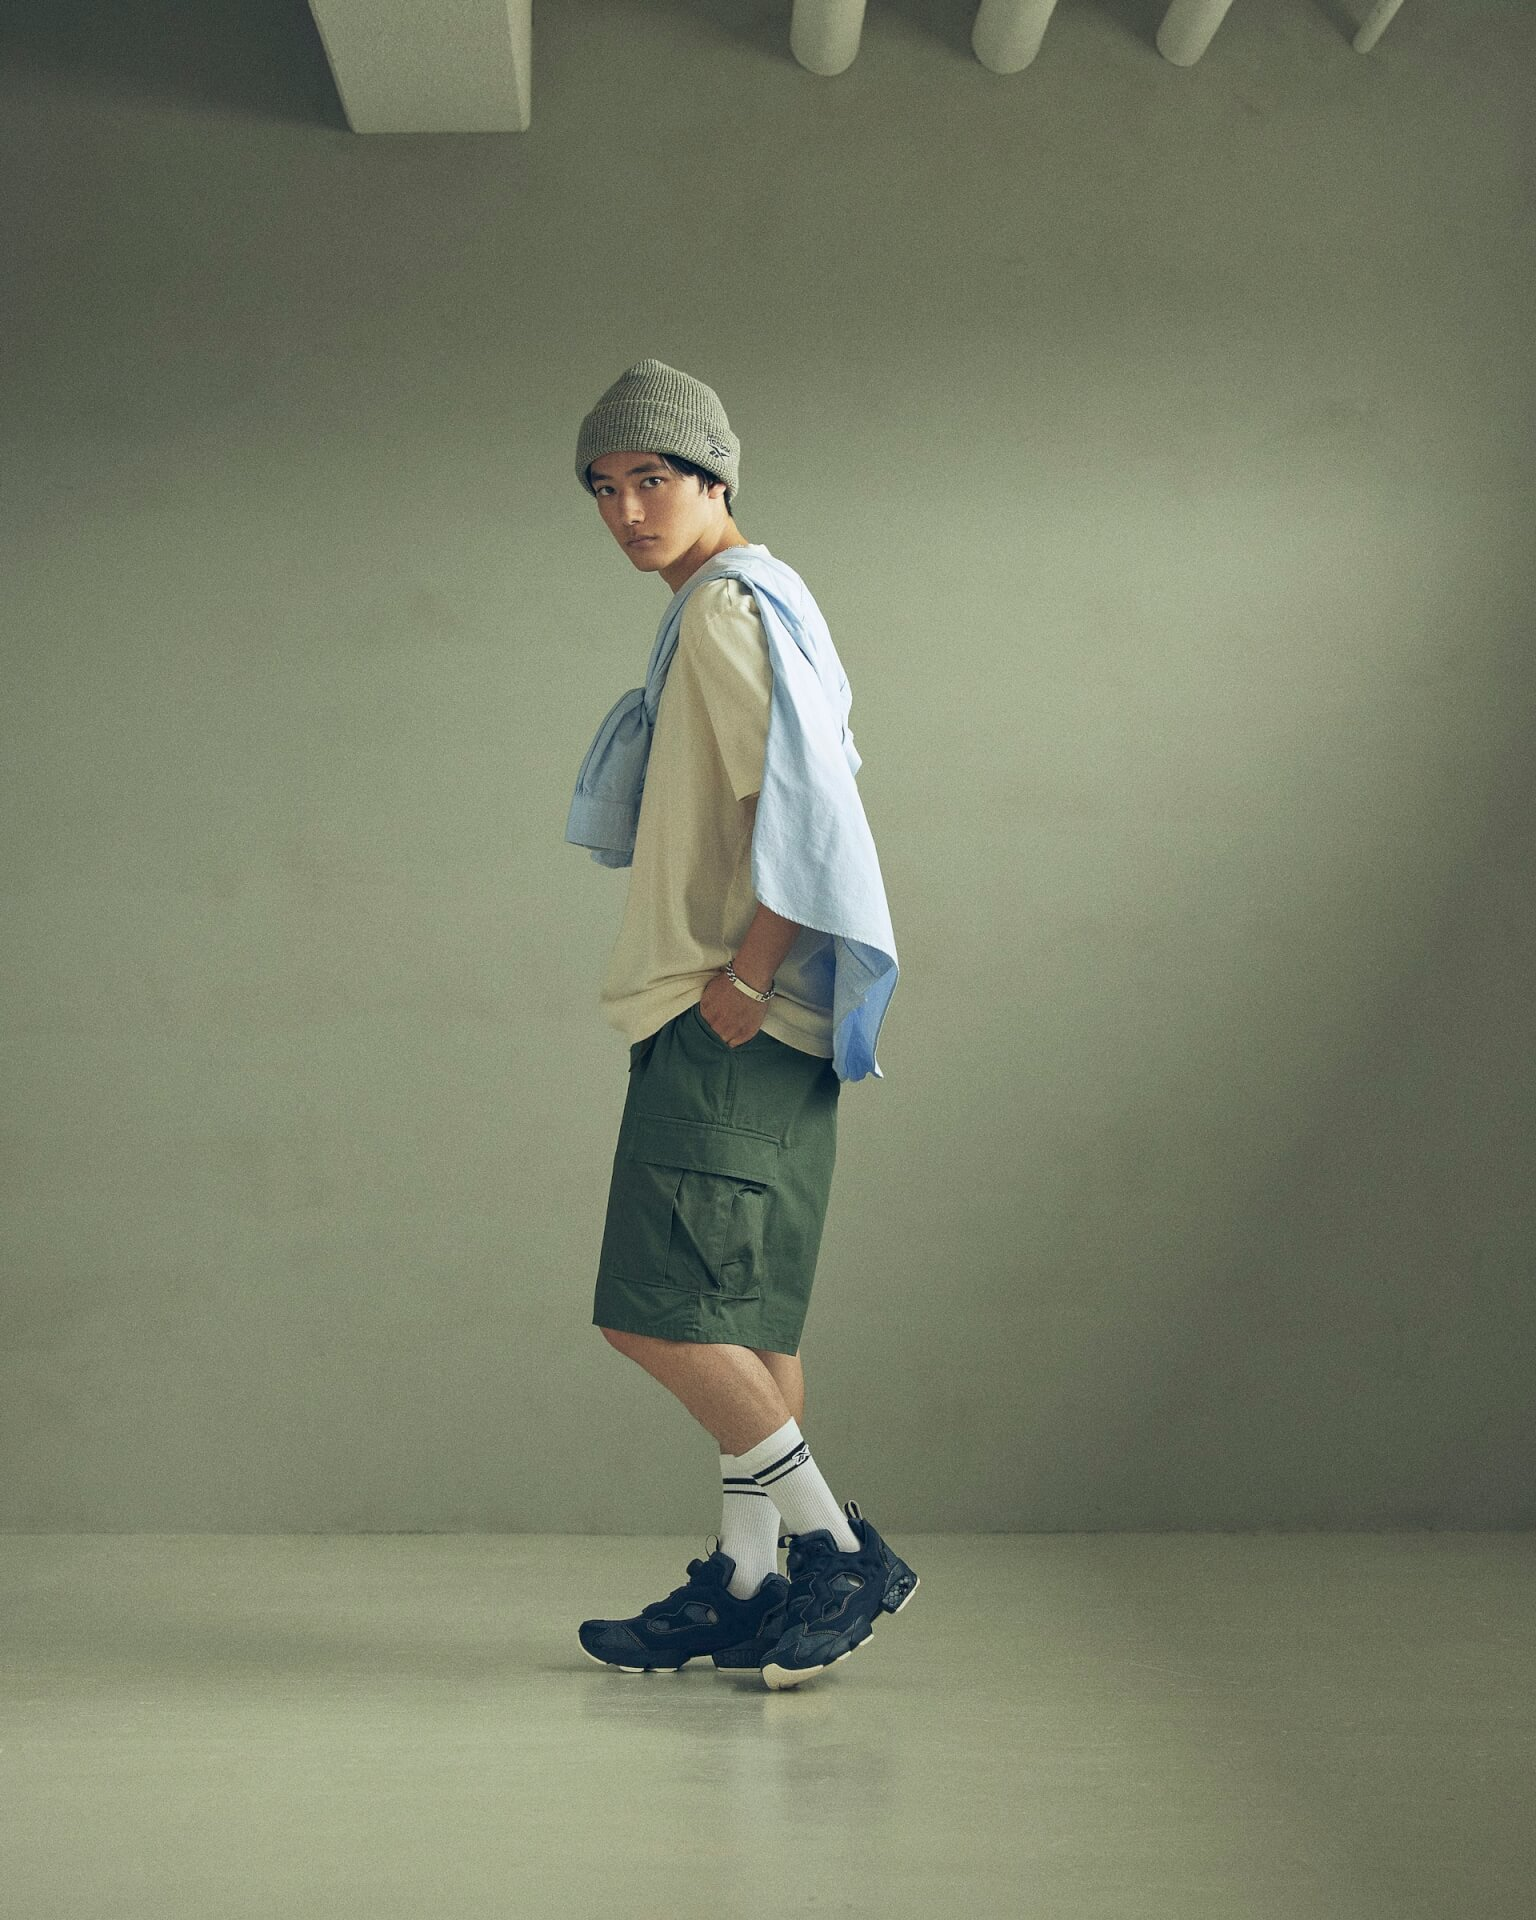 ReebokからリアルなデニムをイメージしたINSTAPUMP FURYの「DENIM PACK」が発売!櫻井海音とアンジュルム佐々木莉佳子がルックに登場 Fashion_210719_denimpack10